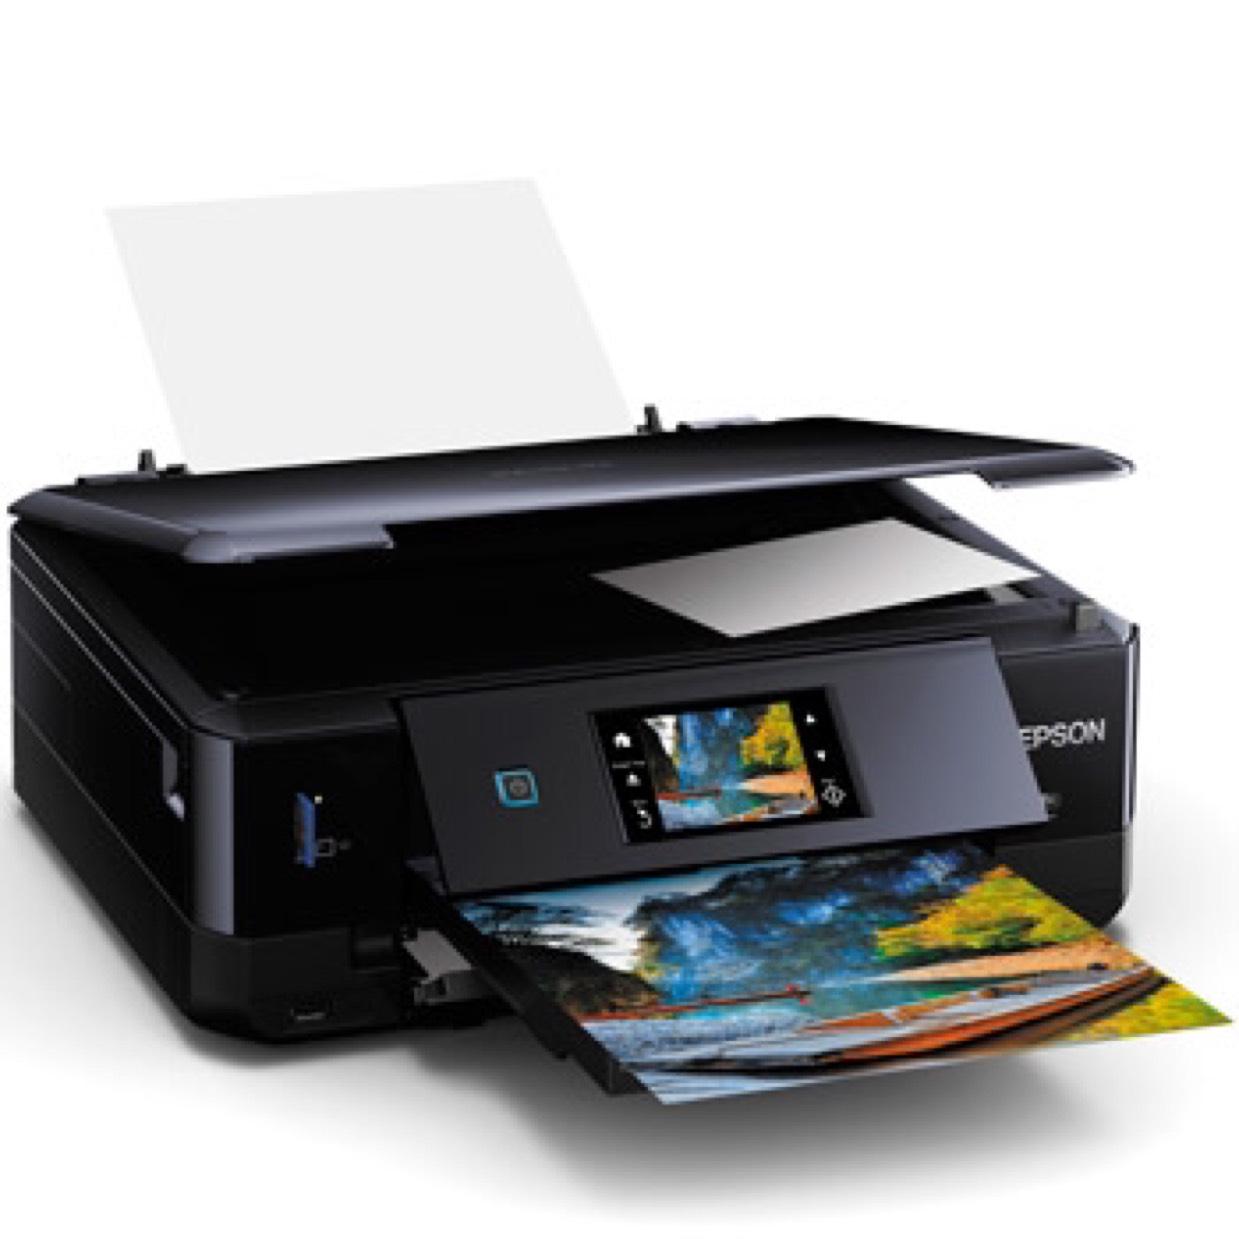 Epson XP-760 Expression All-in-One Photo Printer £69.99 Costco